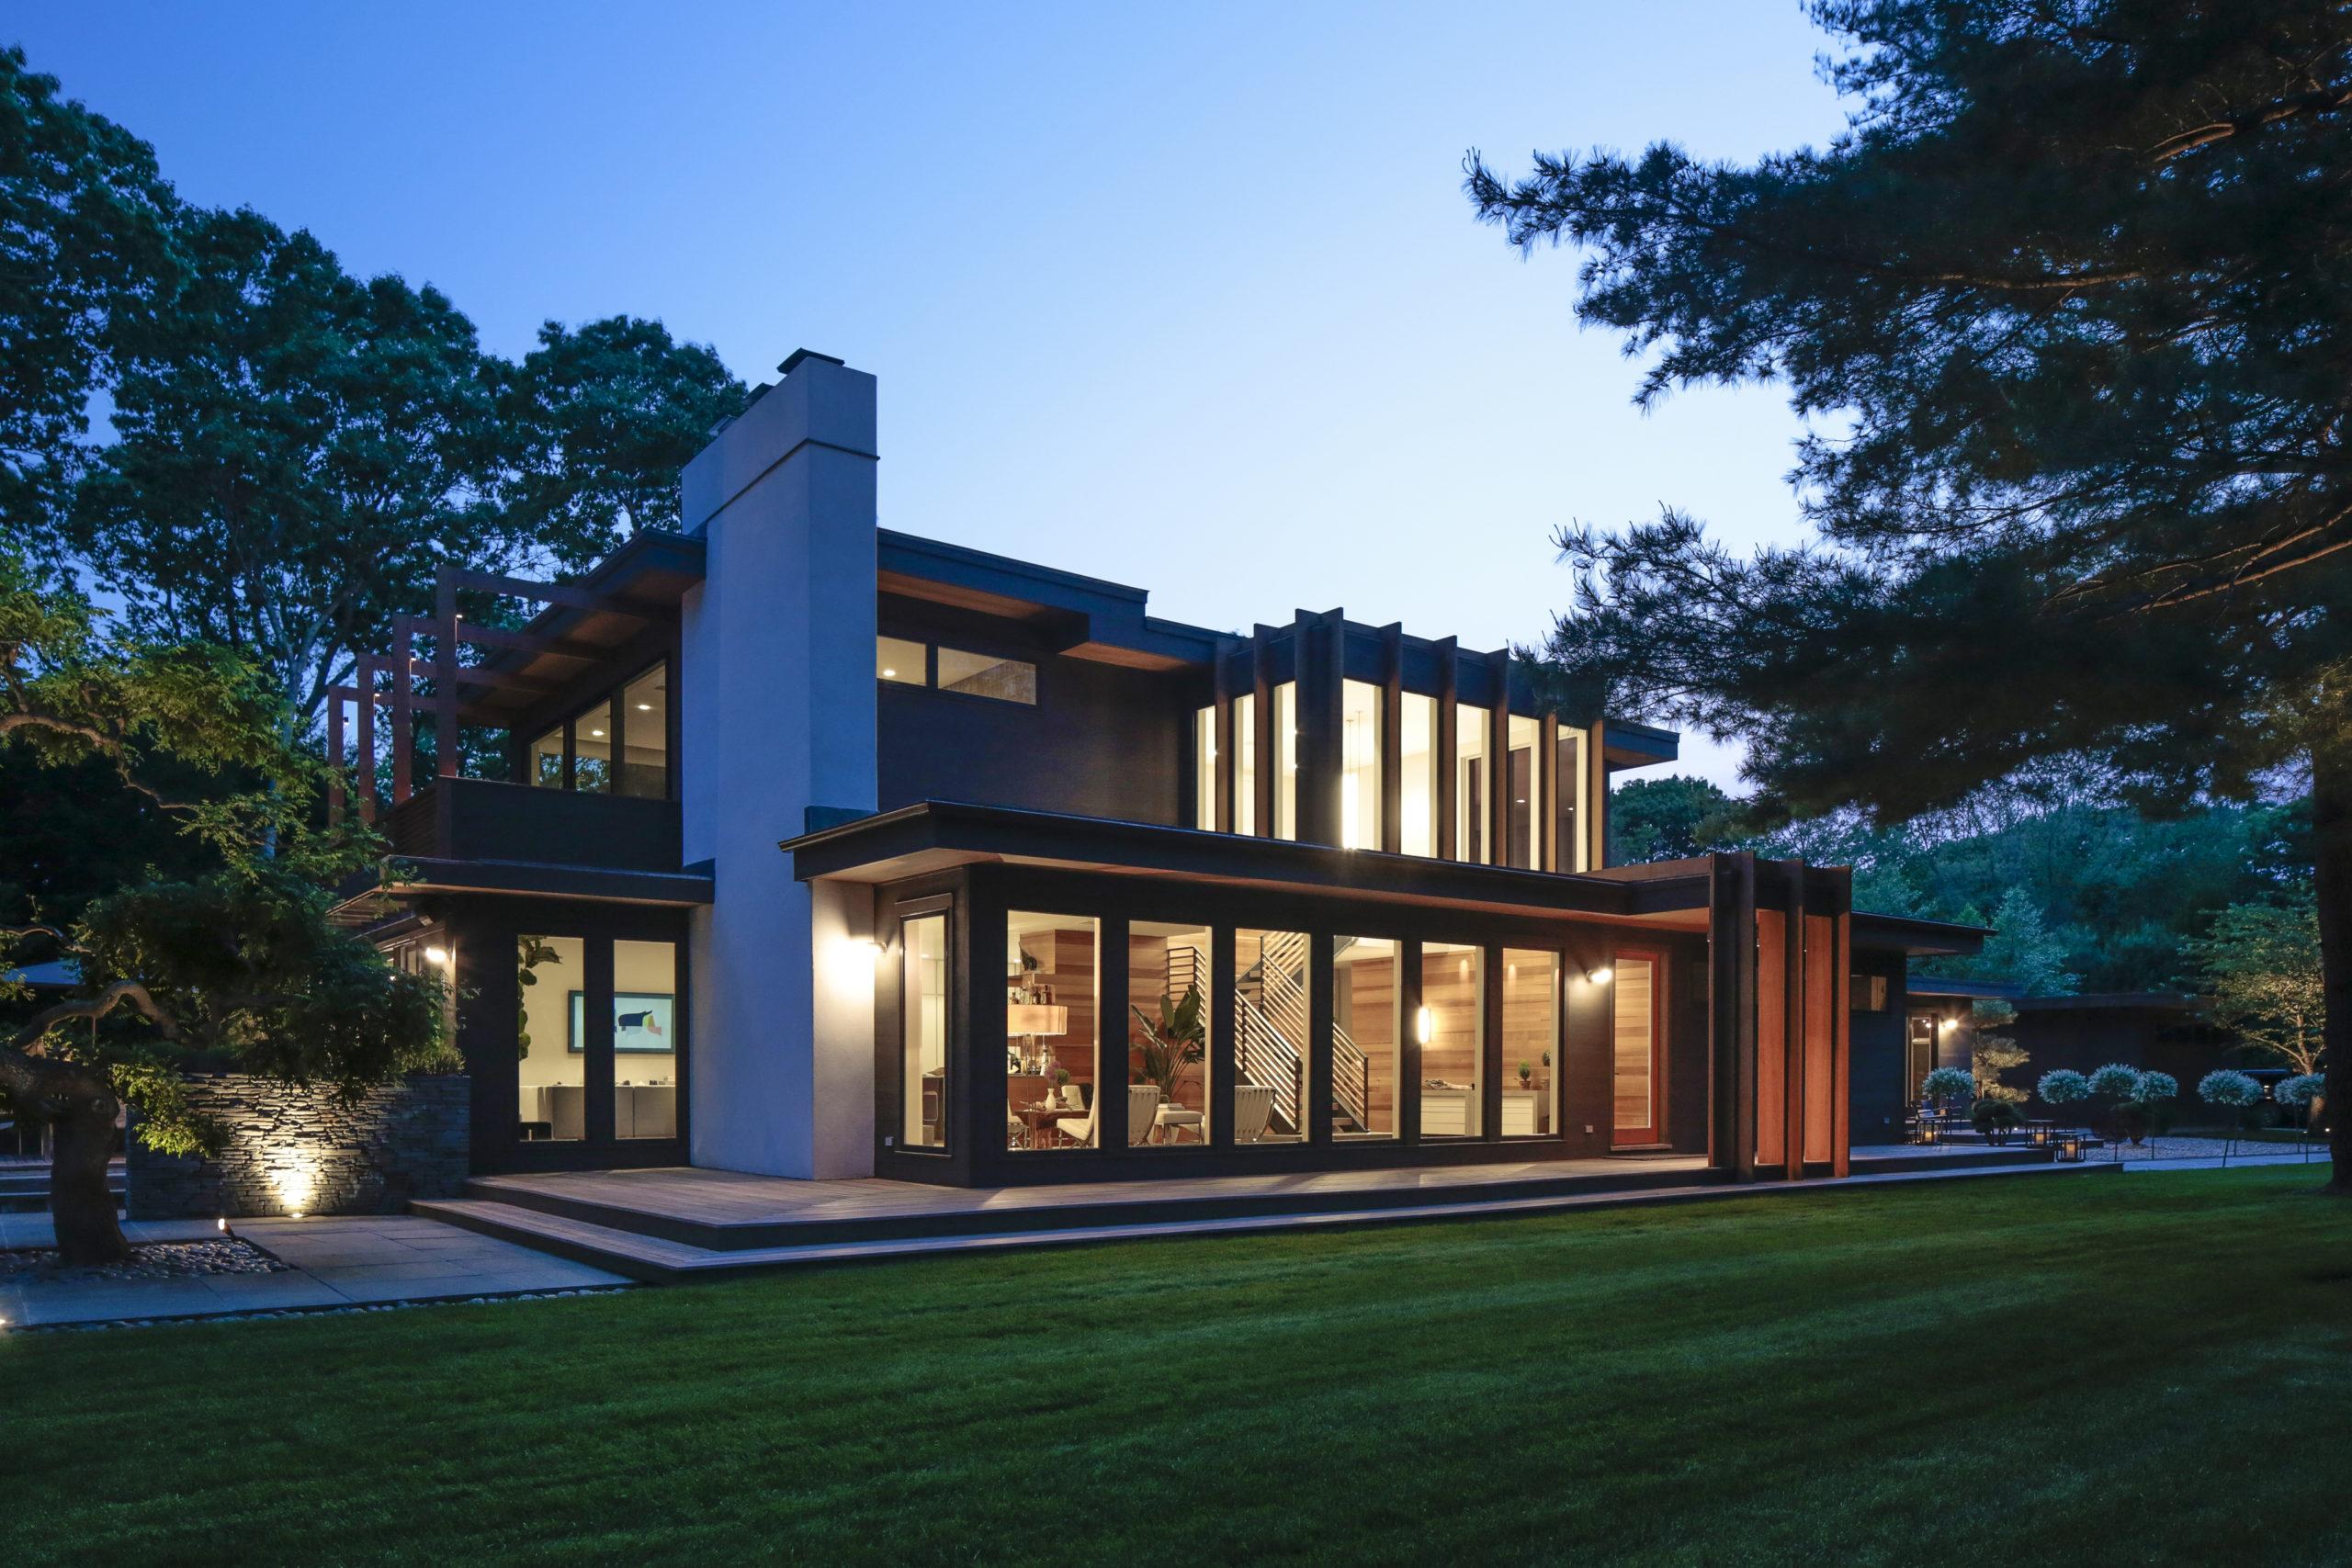 Kurt Giehl and Jeff Ragovin's Springs home.